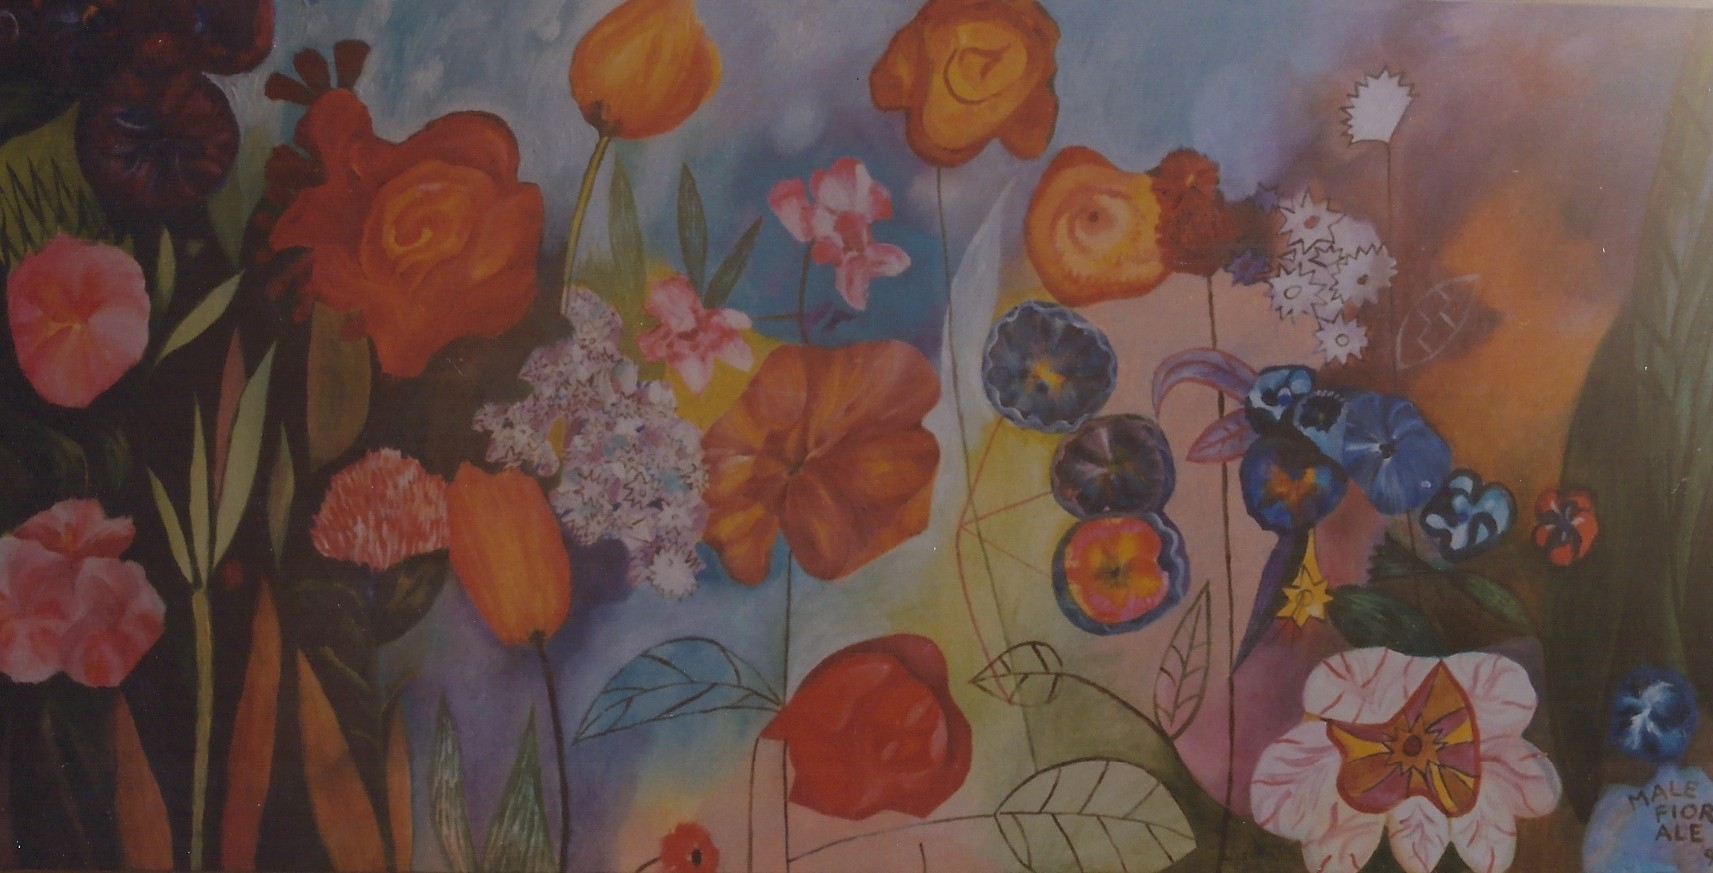 FIORALELLANDO tecnica mista su carta pittura cm 35 x cm 70 1998